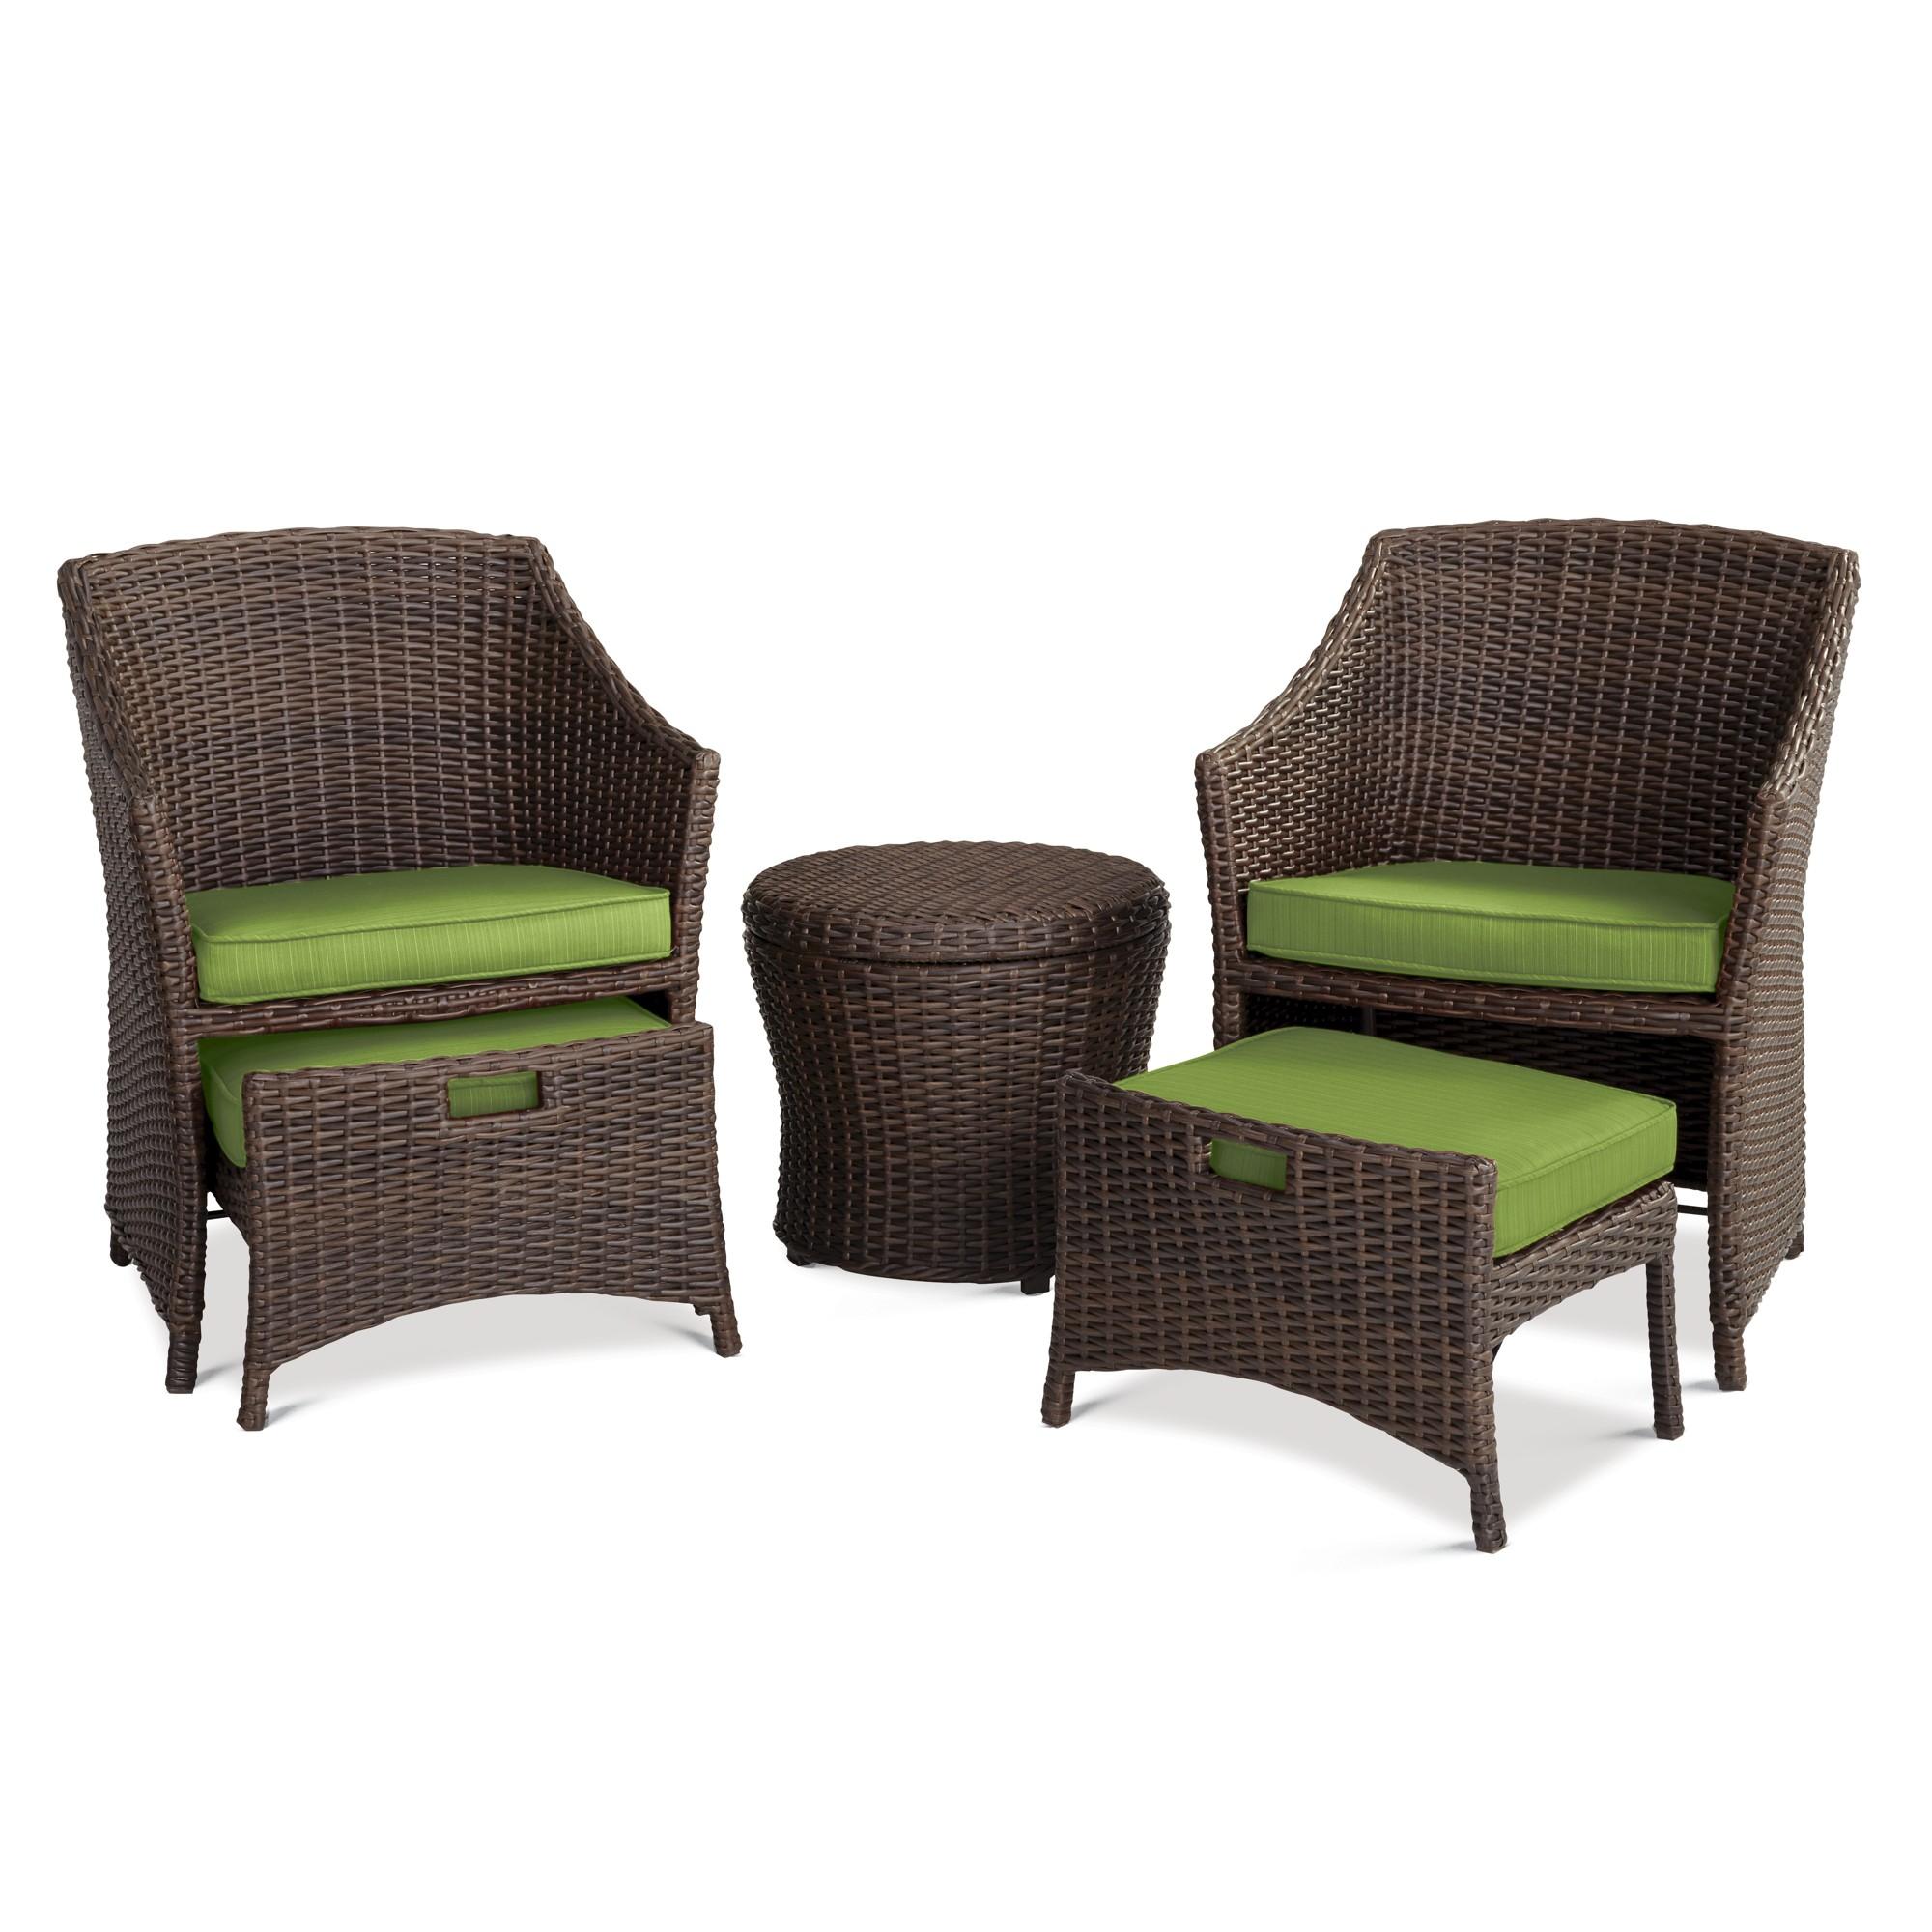 Belvedere 5pc Wicker Patio Seating Set Green Threshold